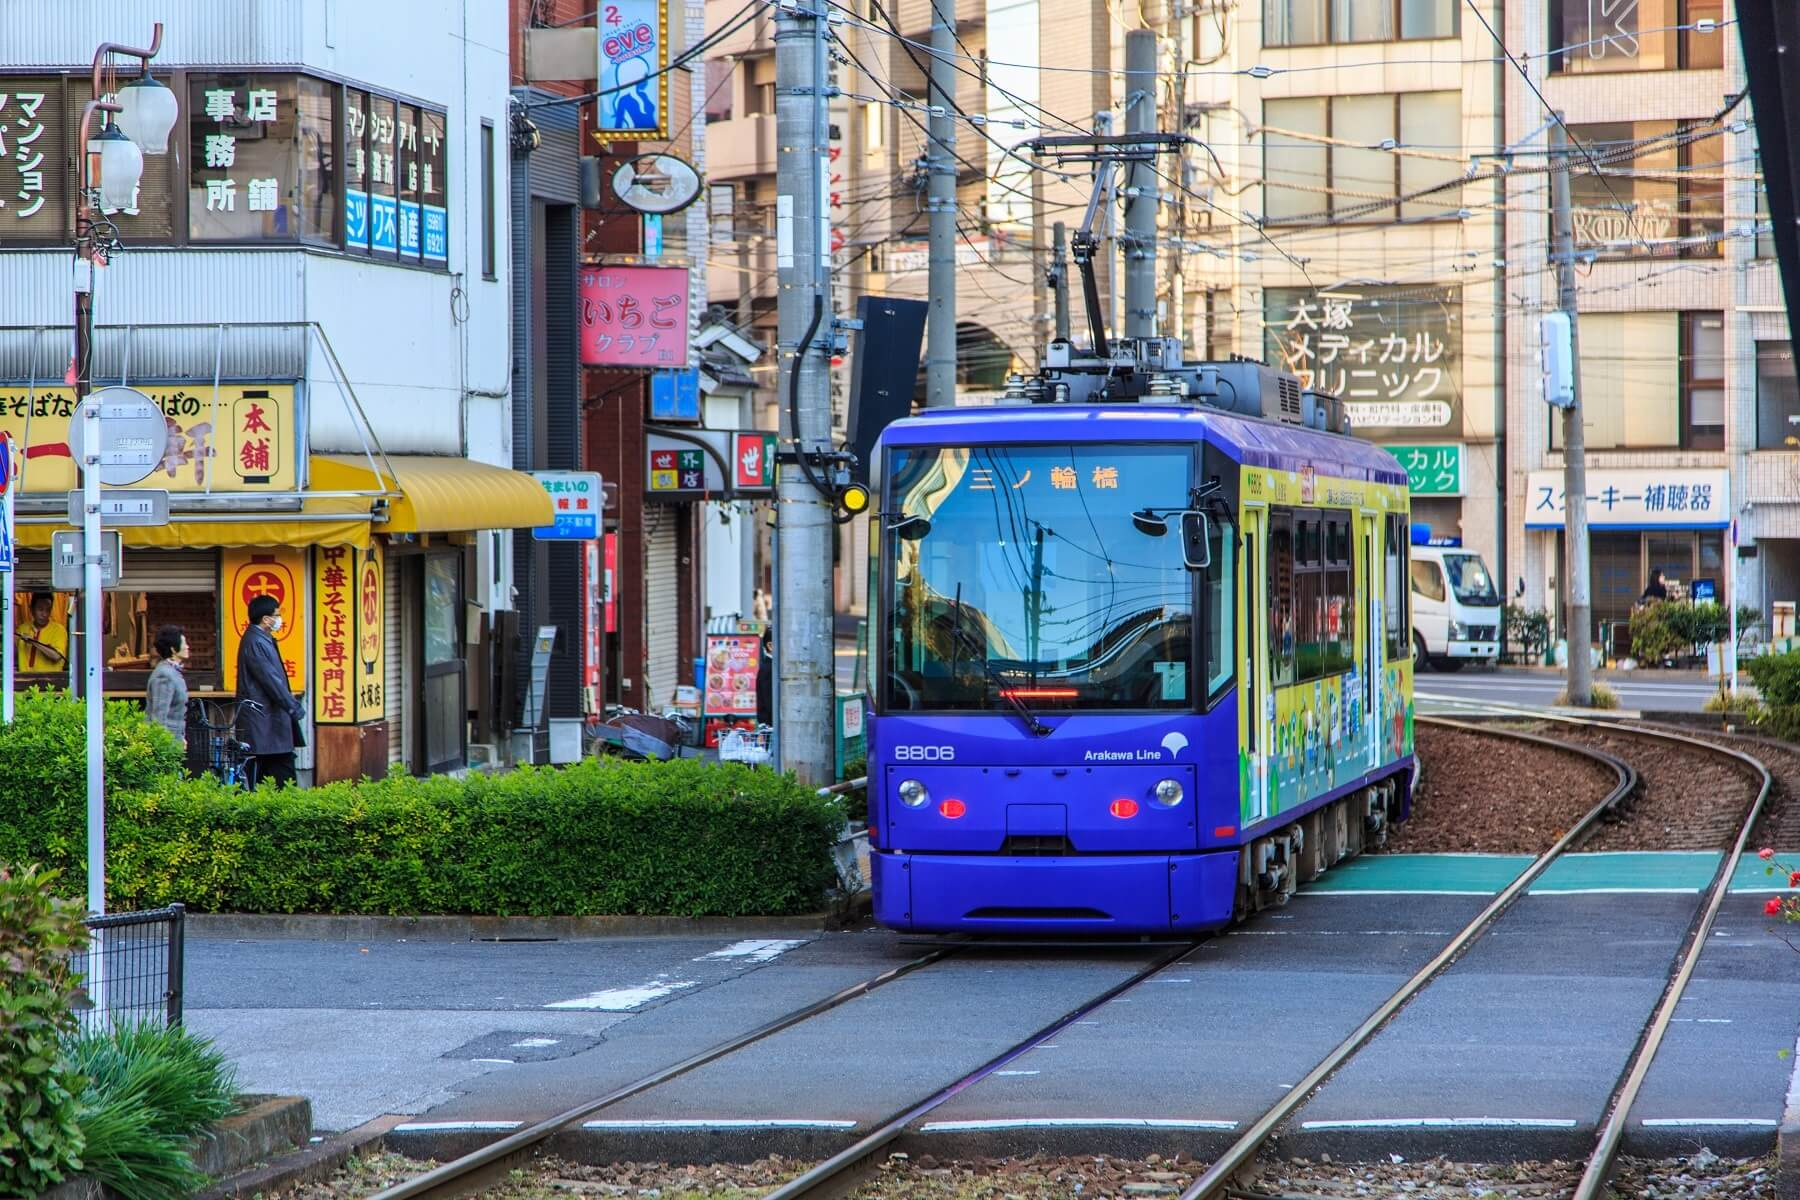 Tram, Otsuka, Tokyo